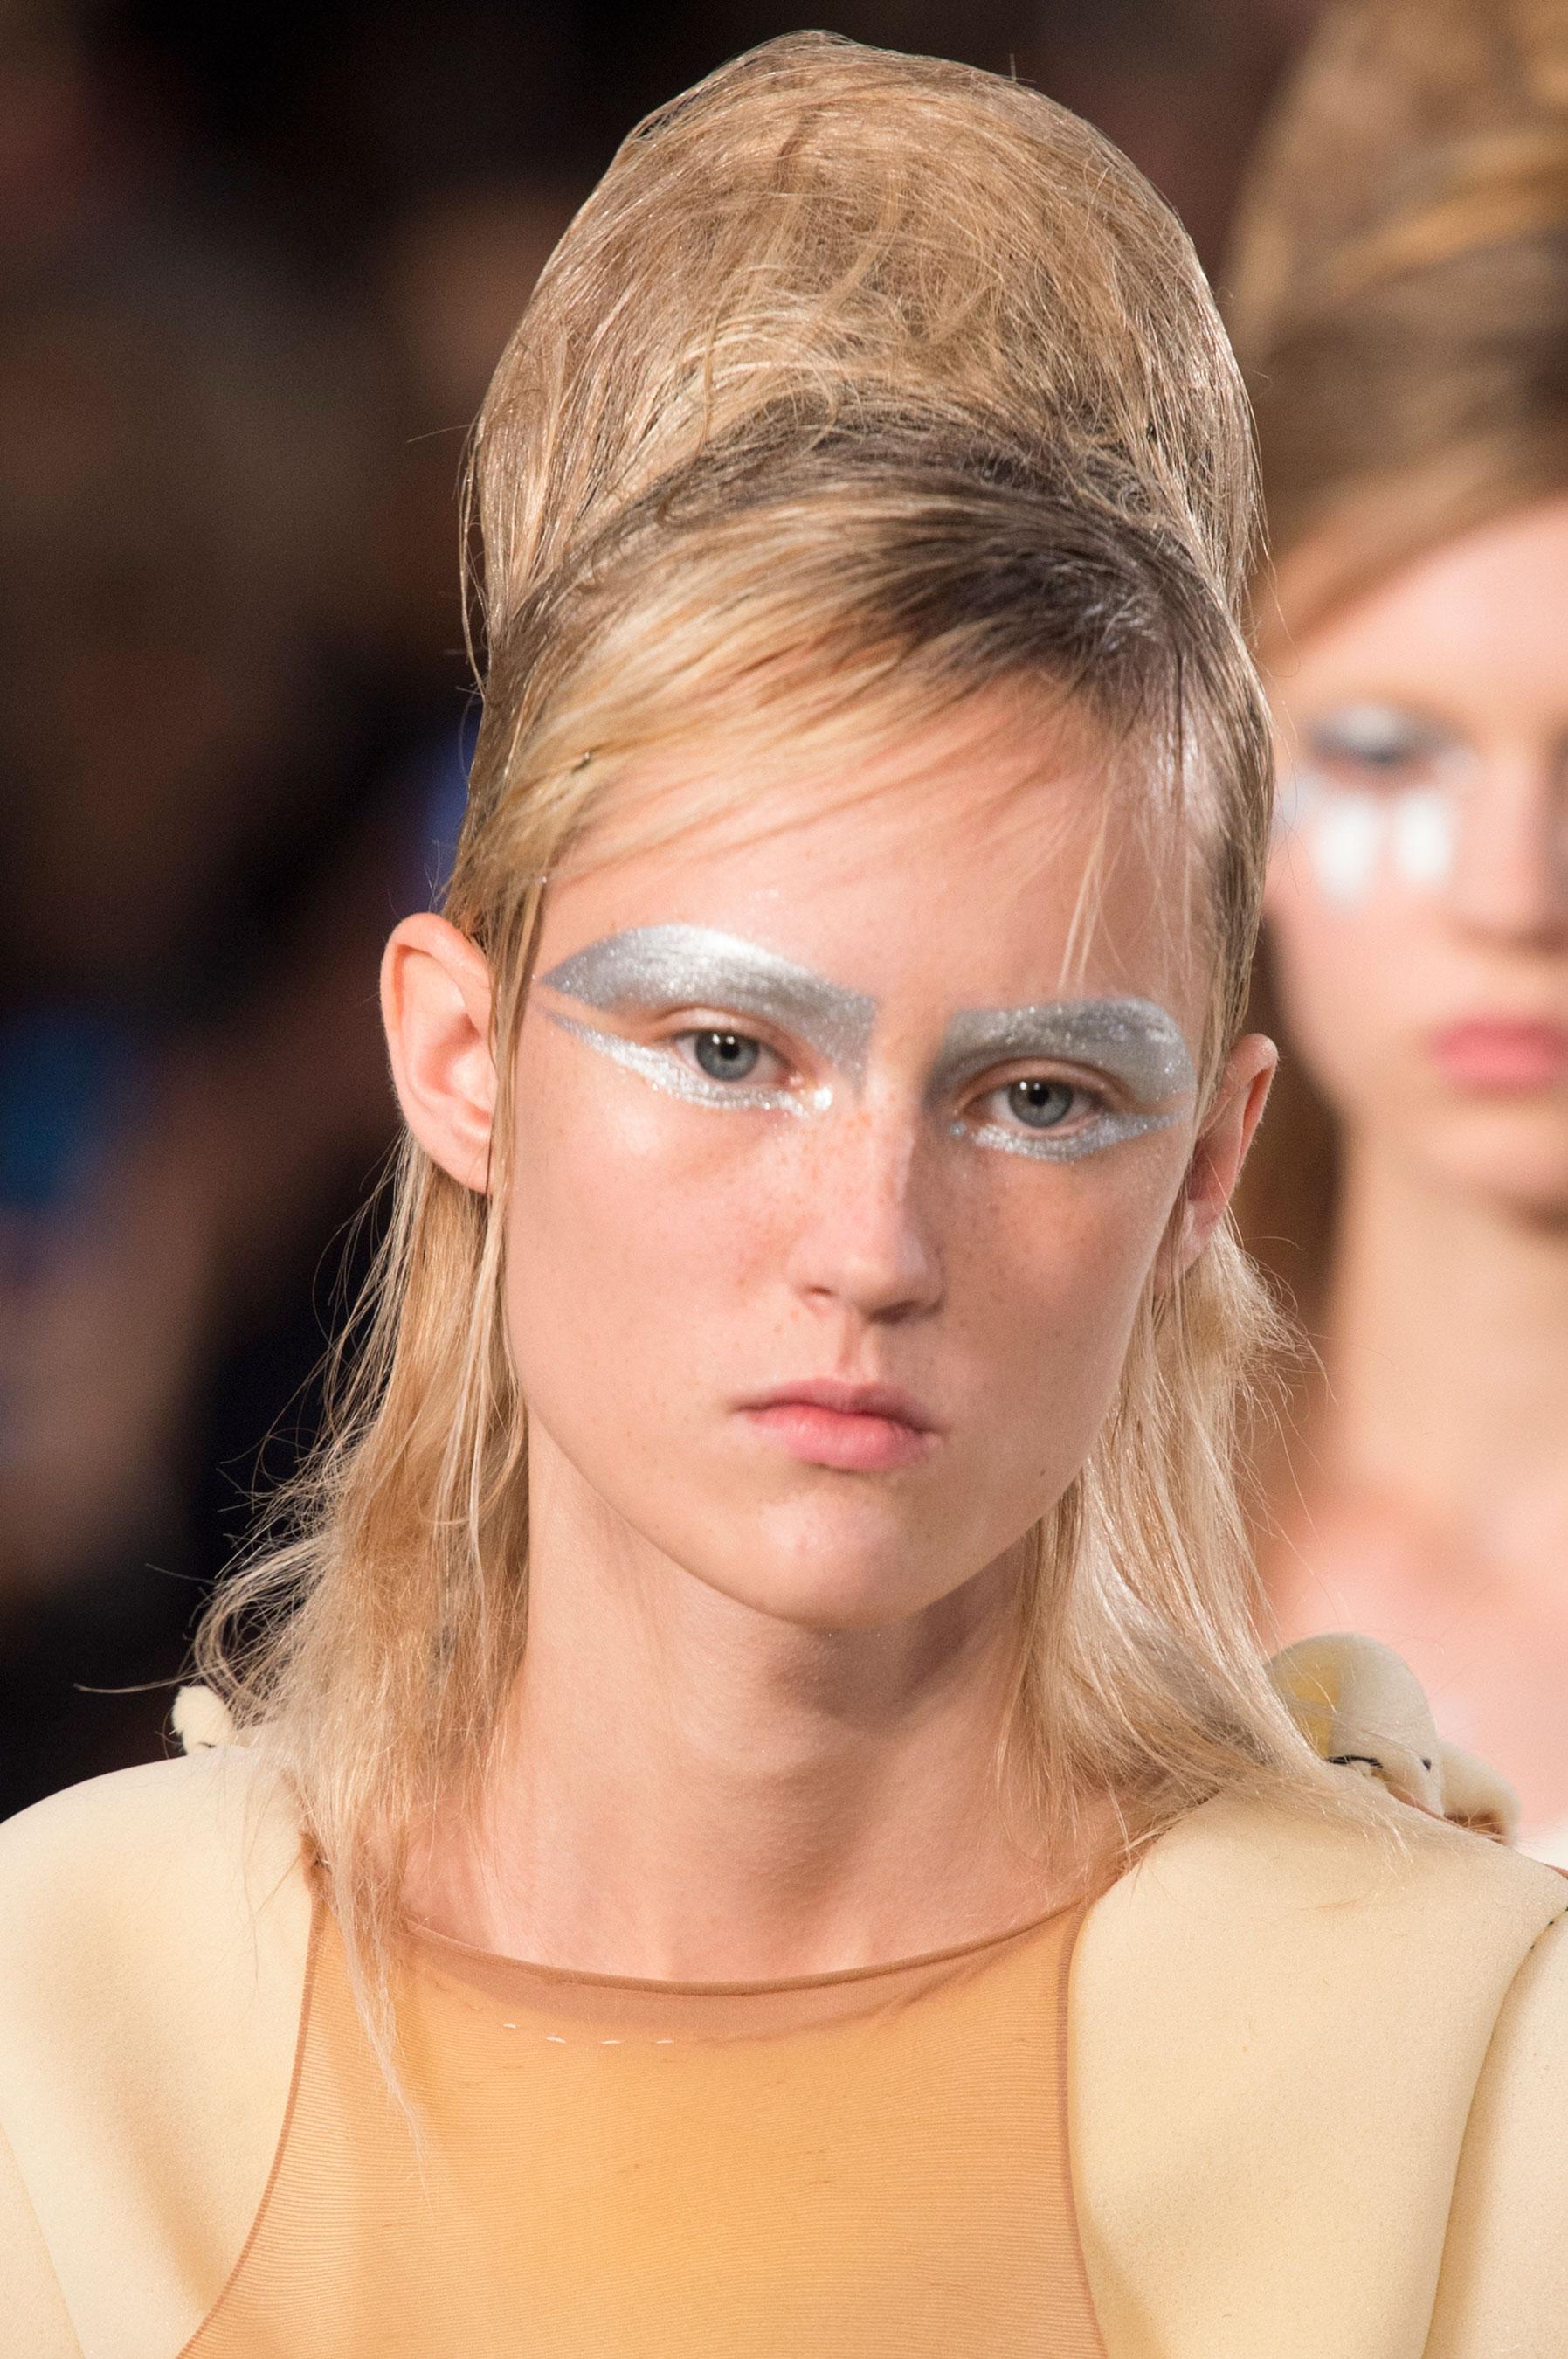 Maison-Margiela-spring-2016-runway-beauty-fashion-show-the-impression-068